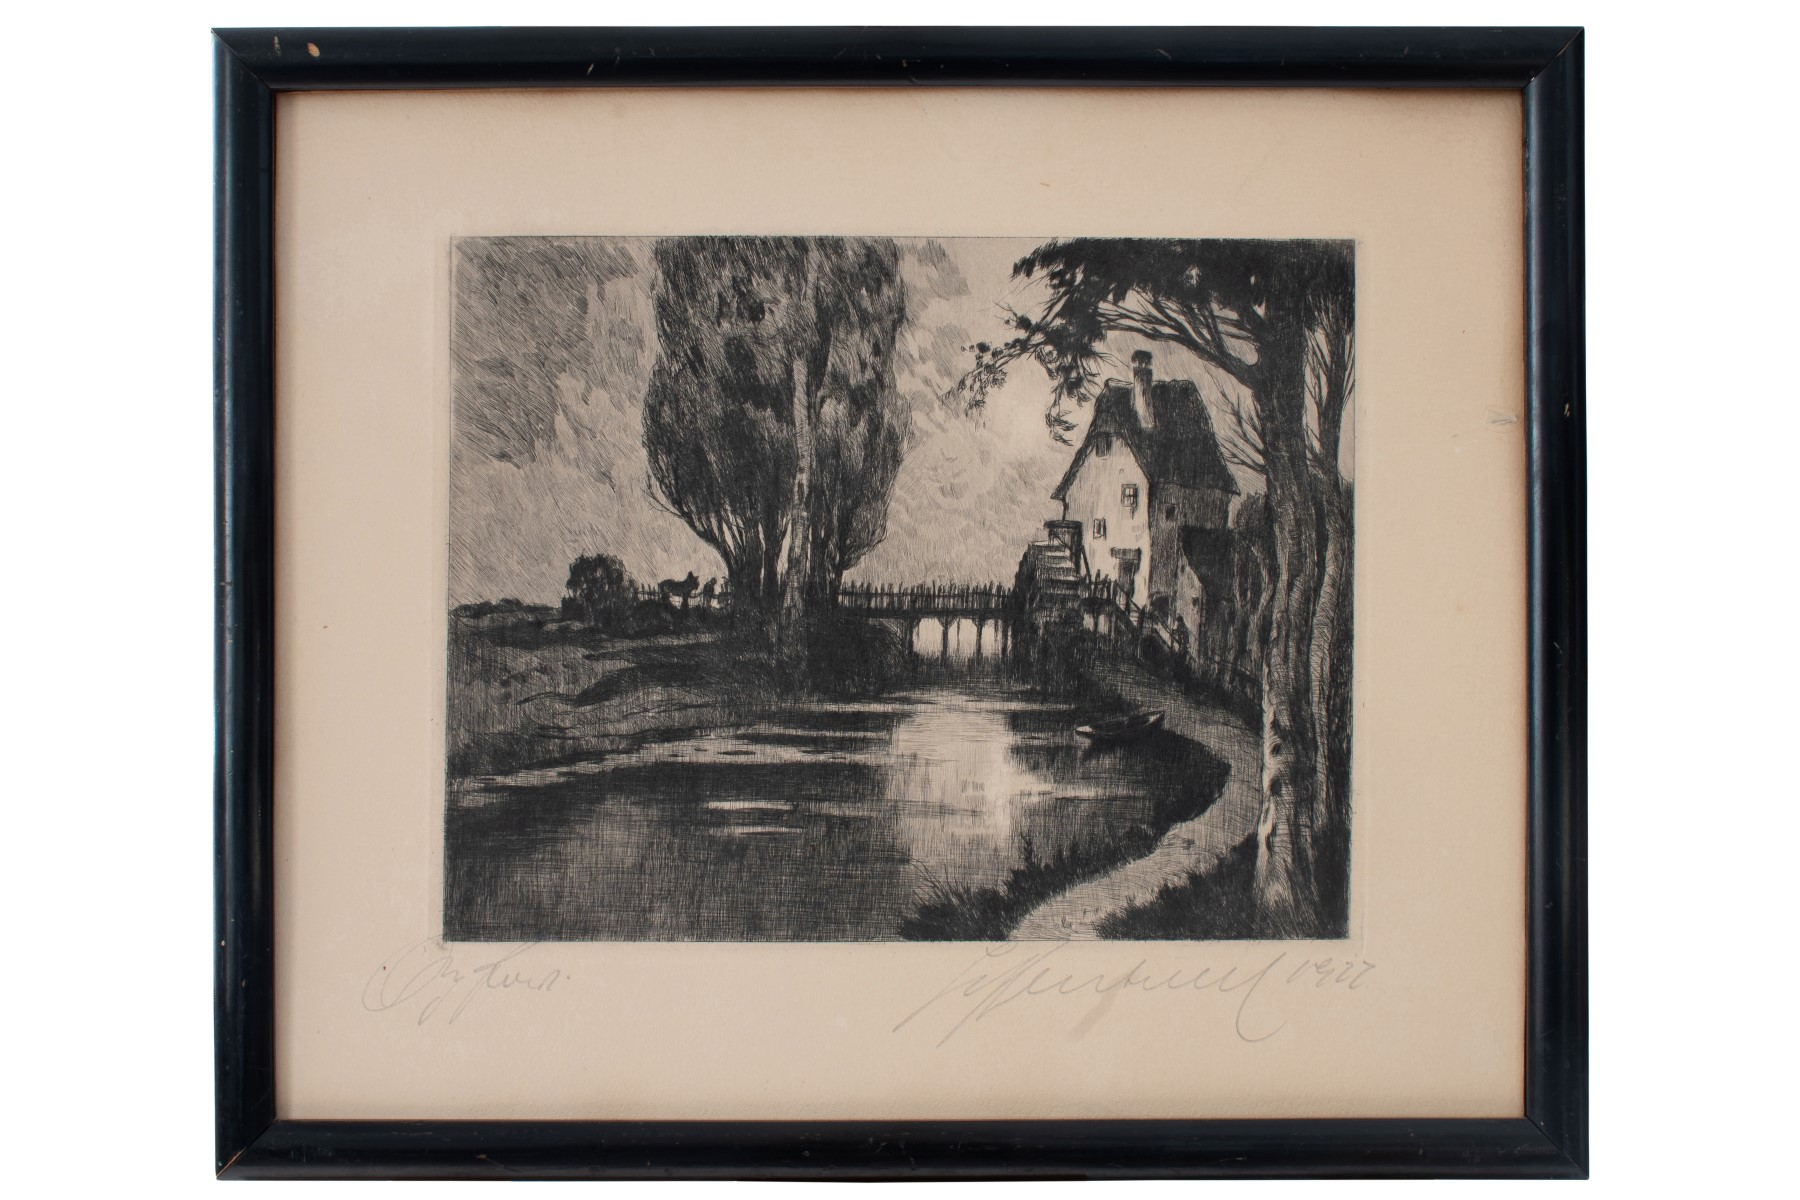 #40 Hugo Henschl (1879-1929) , Mill By The River   Hugo Henschel (1879-1929), Mühle Am Fluss Image